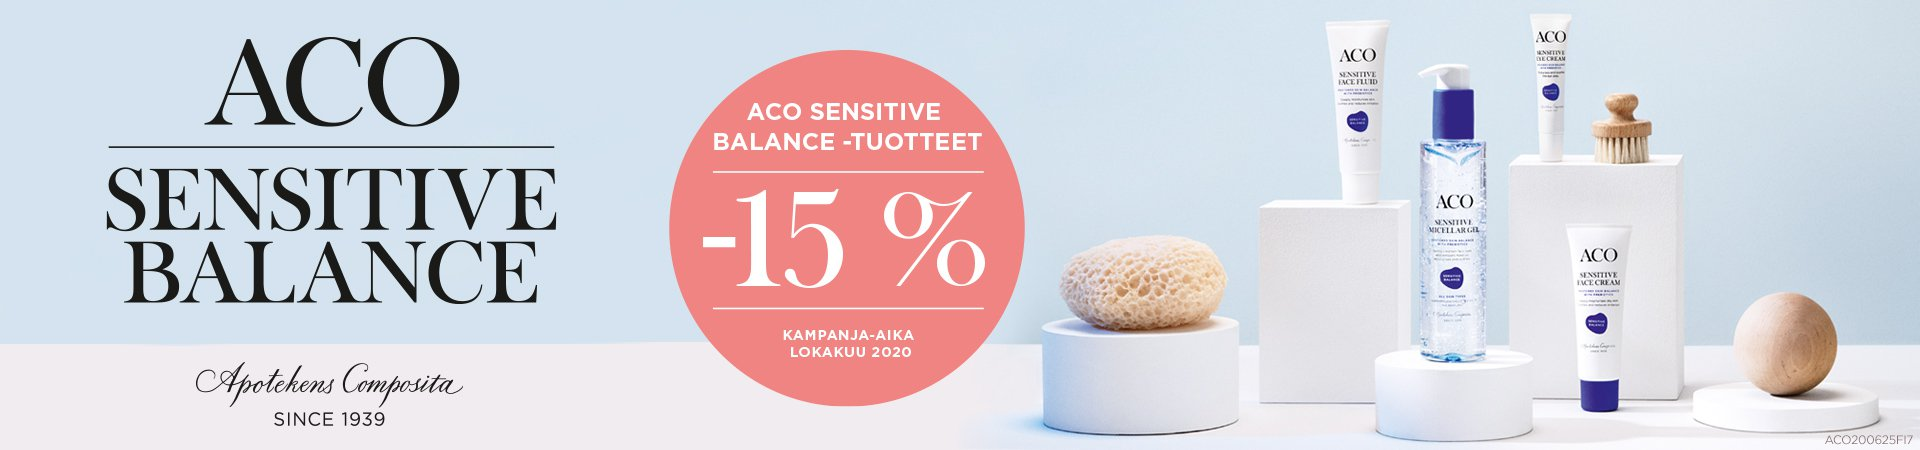 Aco sensitive balance lokakuussa -15%